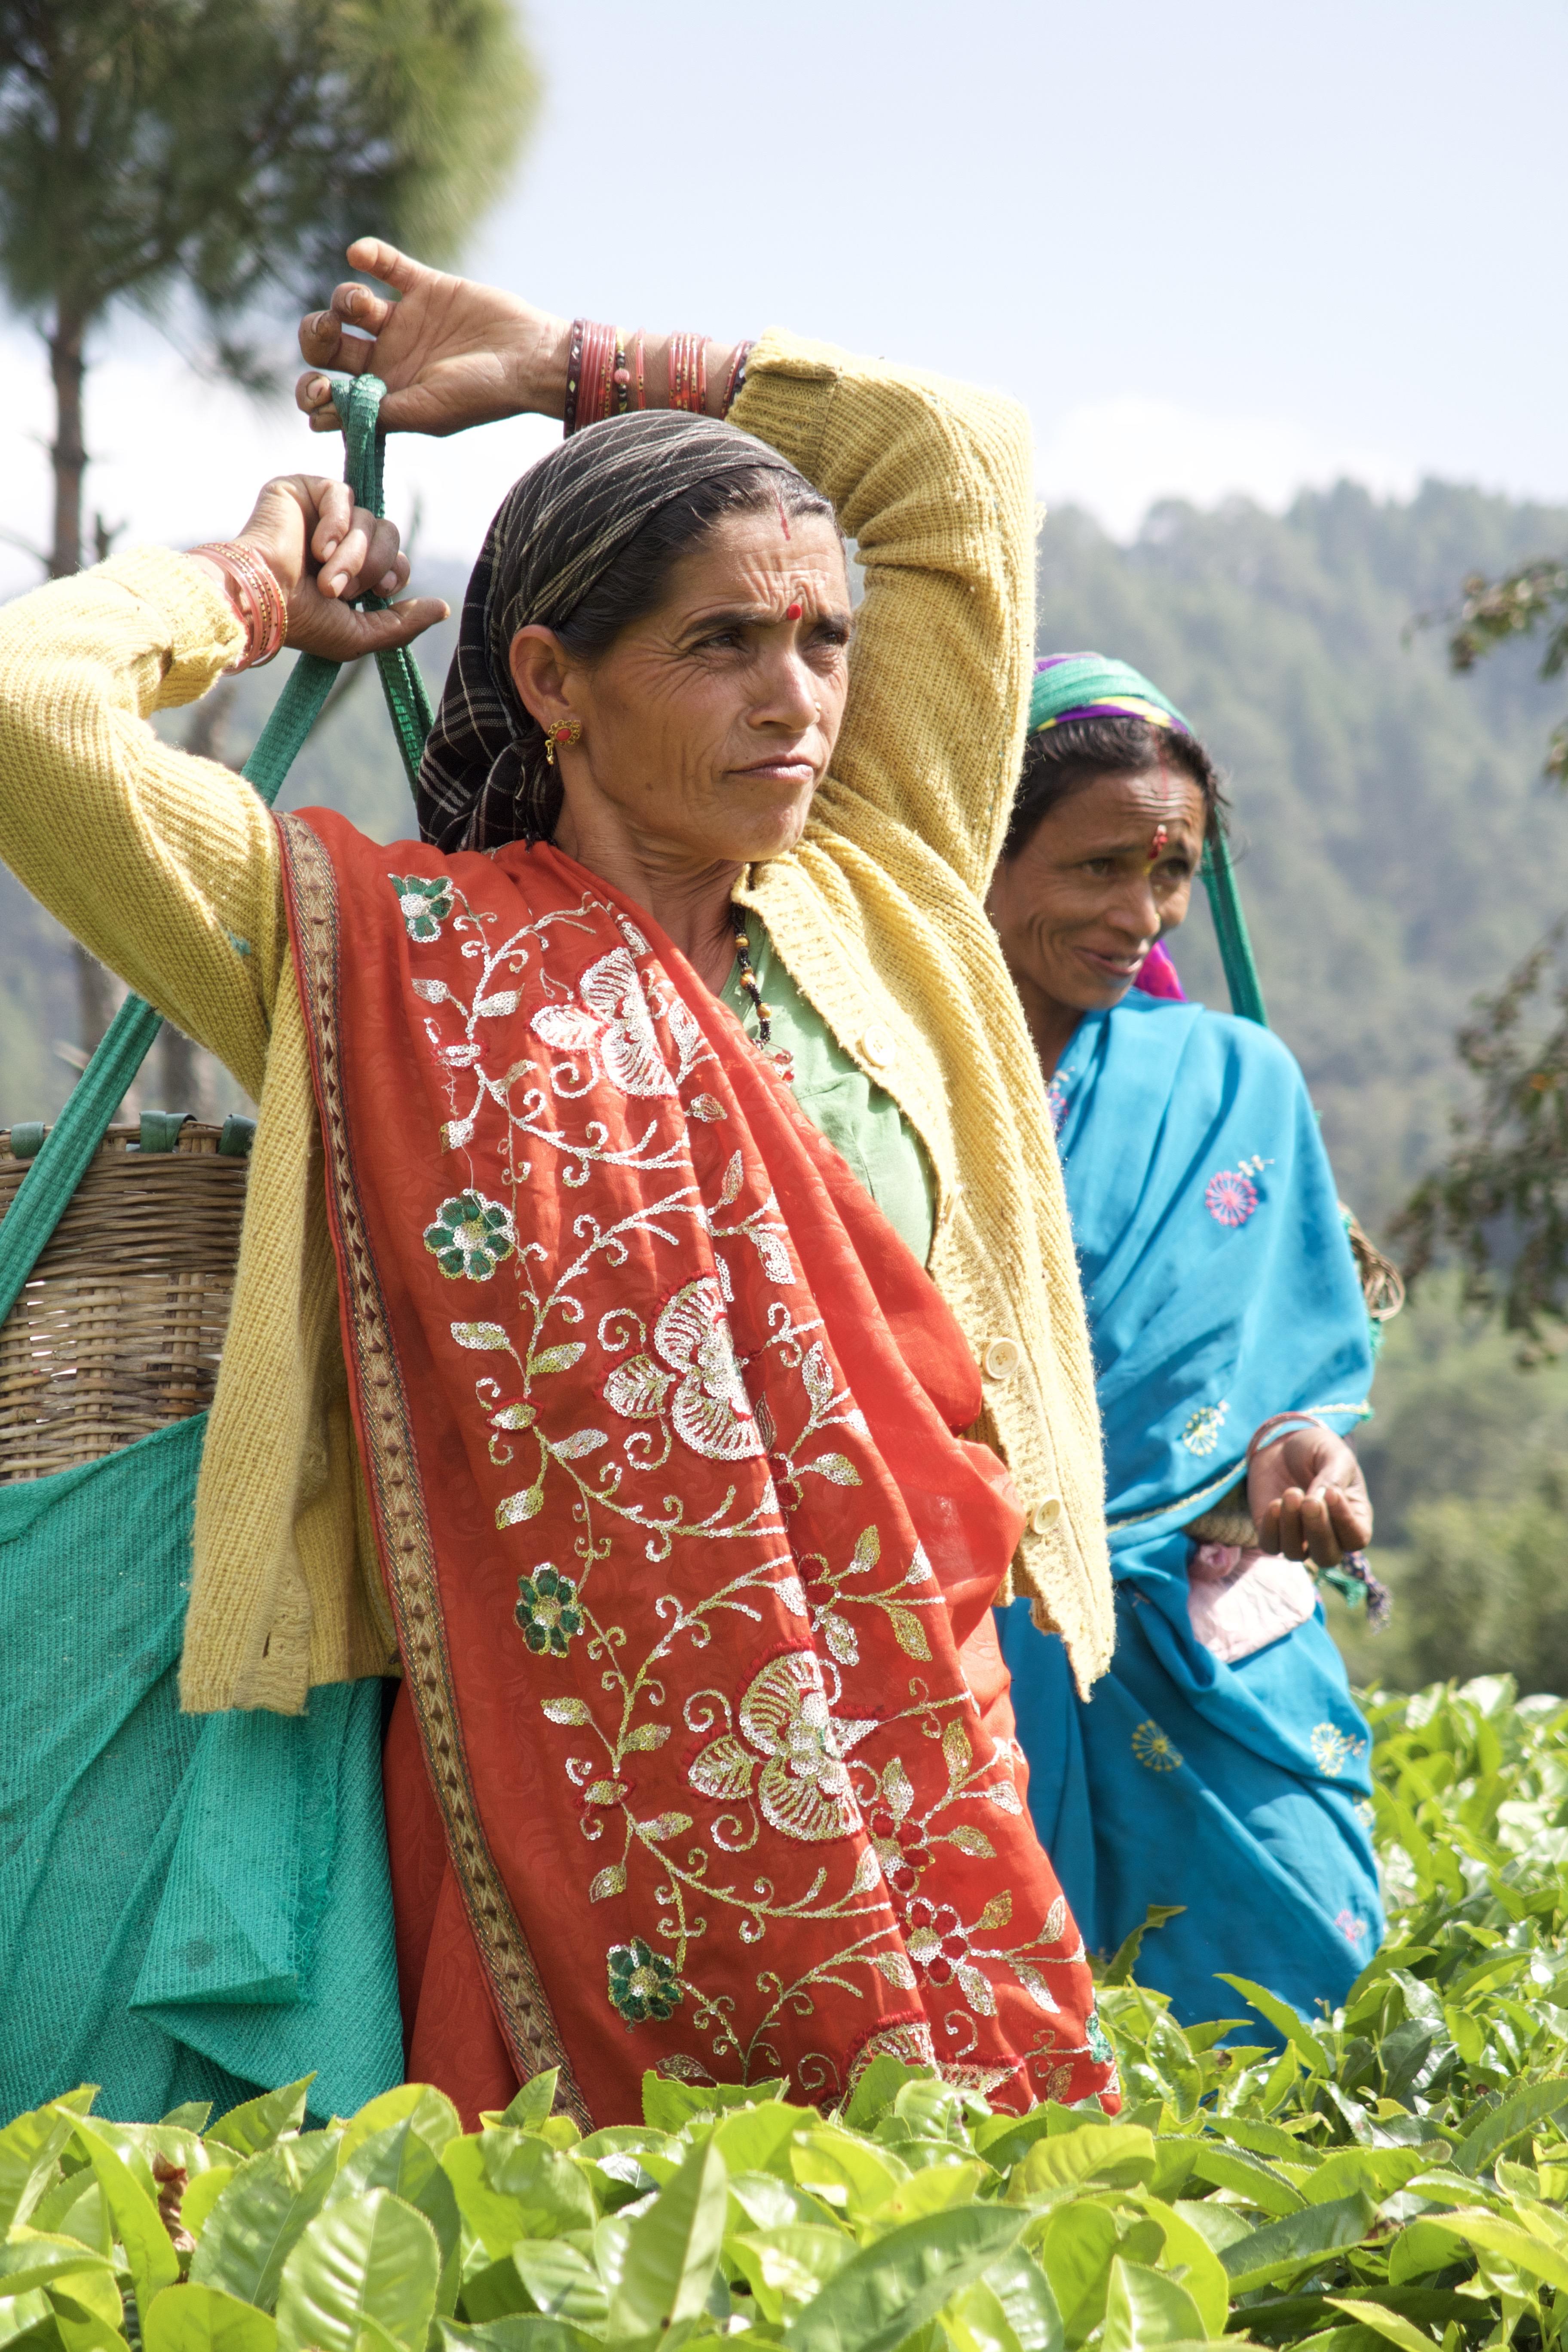 Woman carrying basket of tea leaves in India in Kumaon Tea Region